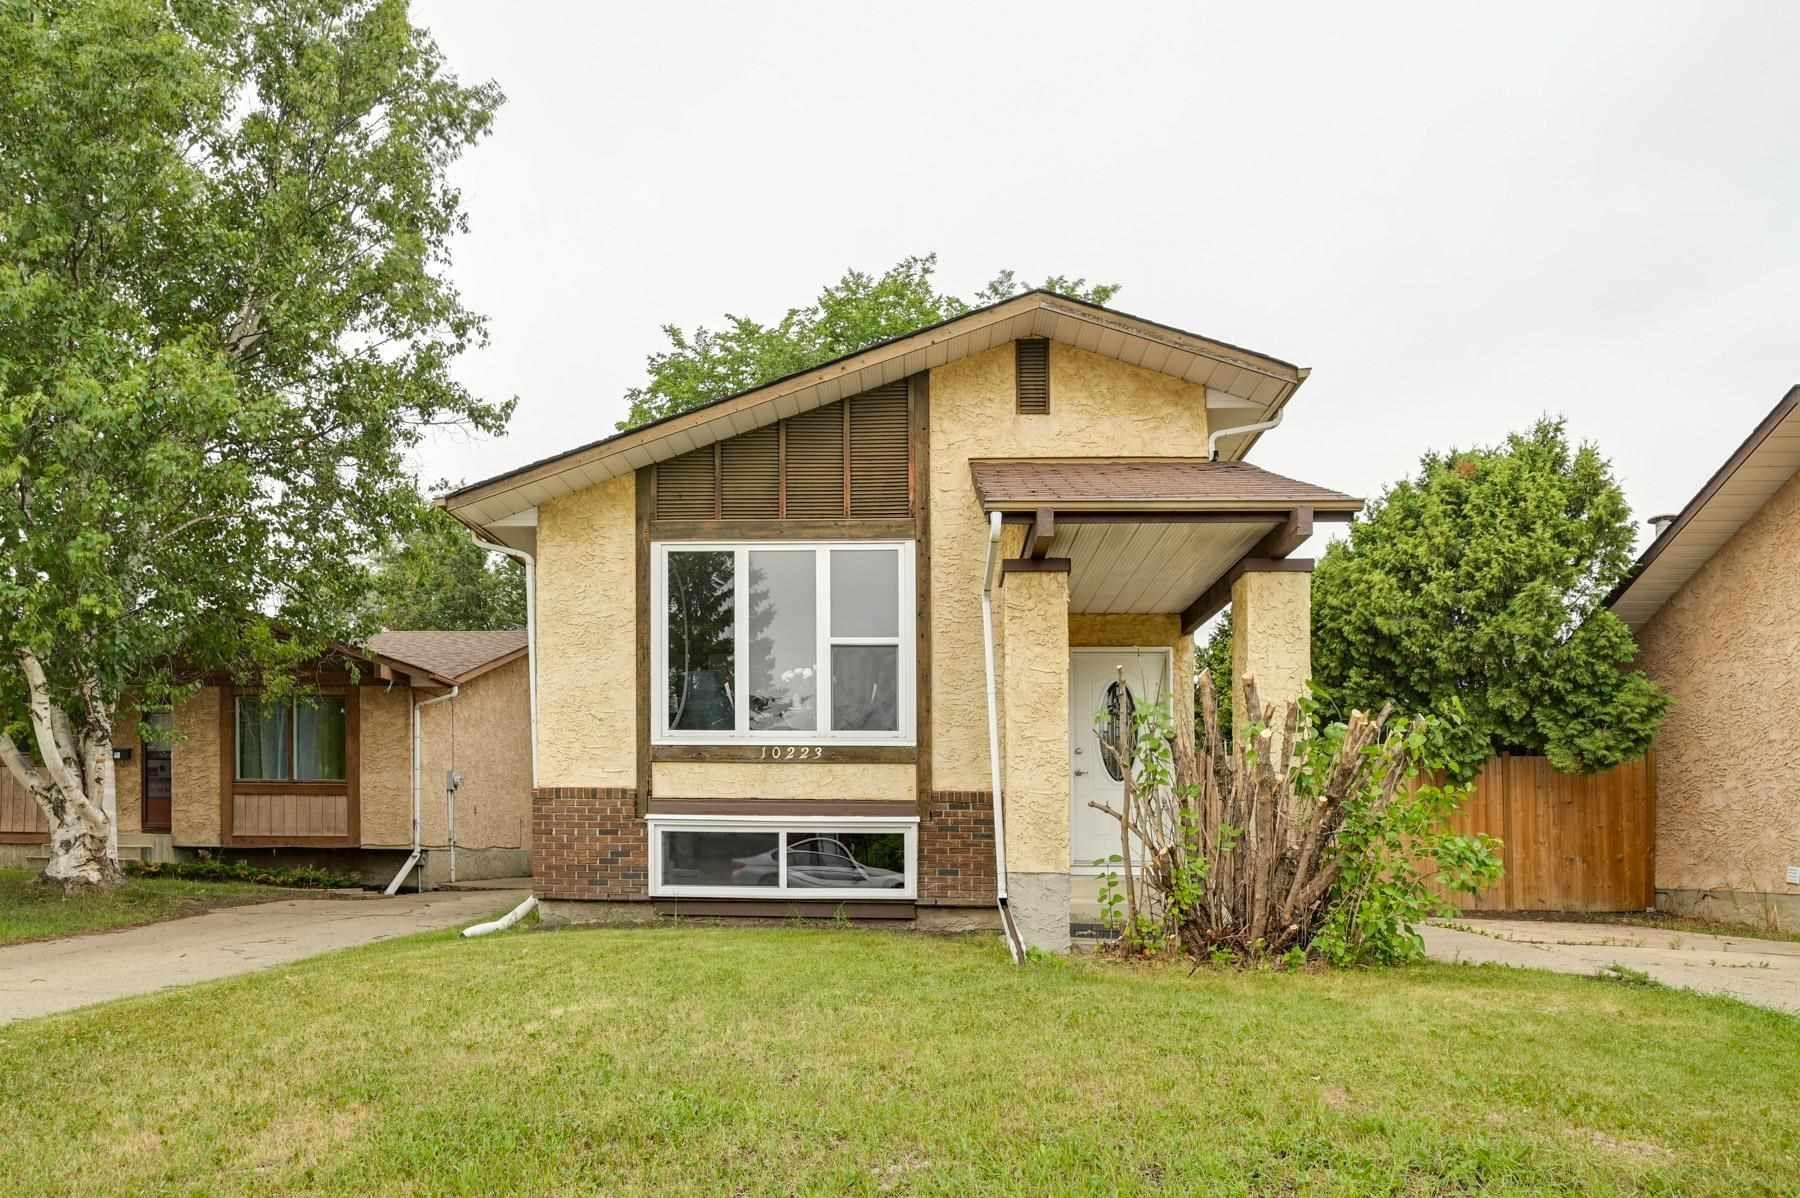 Main Photo: 10223 171A Avenue in Edmonton: Zone 27 House for sale : MLS®# E4255487